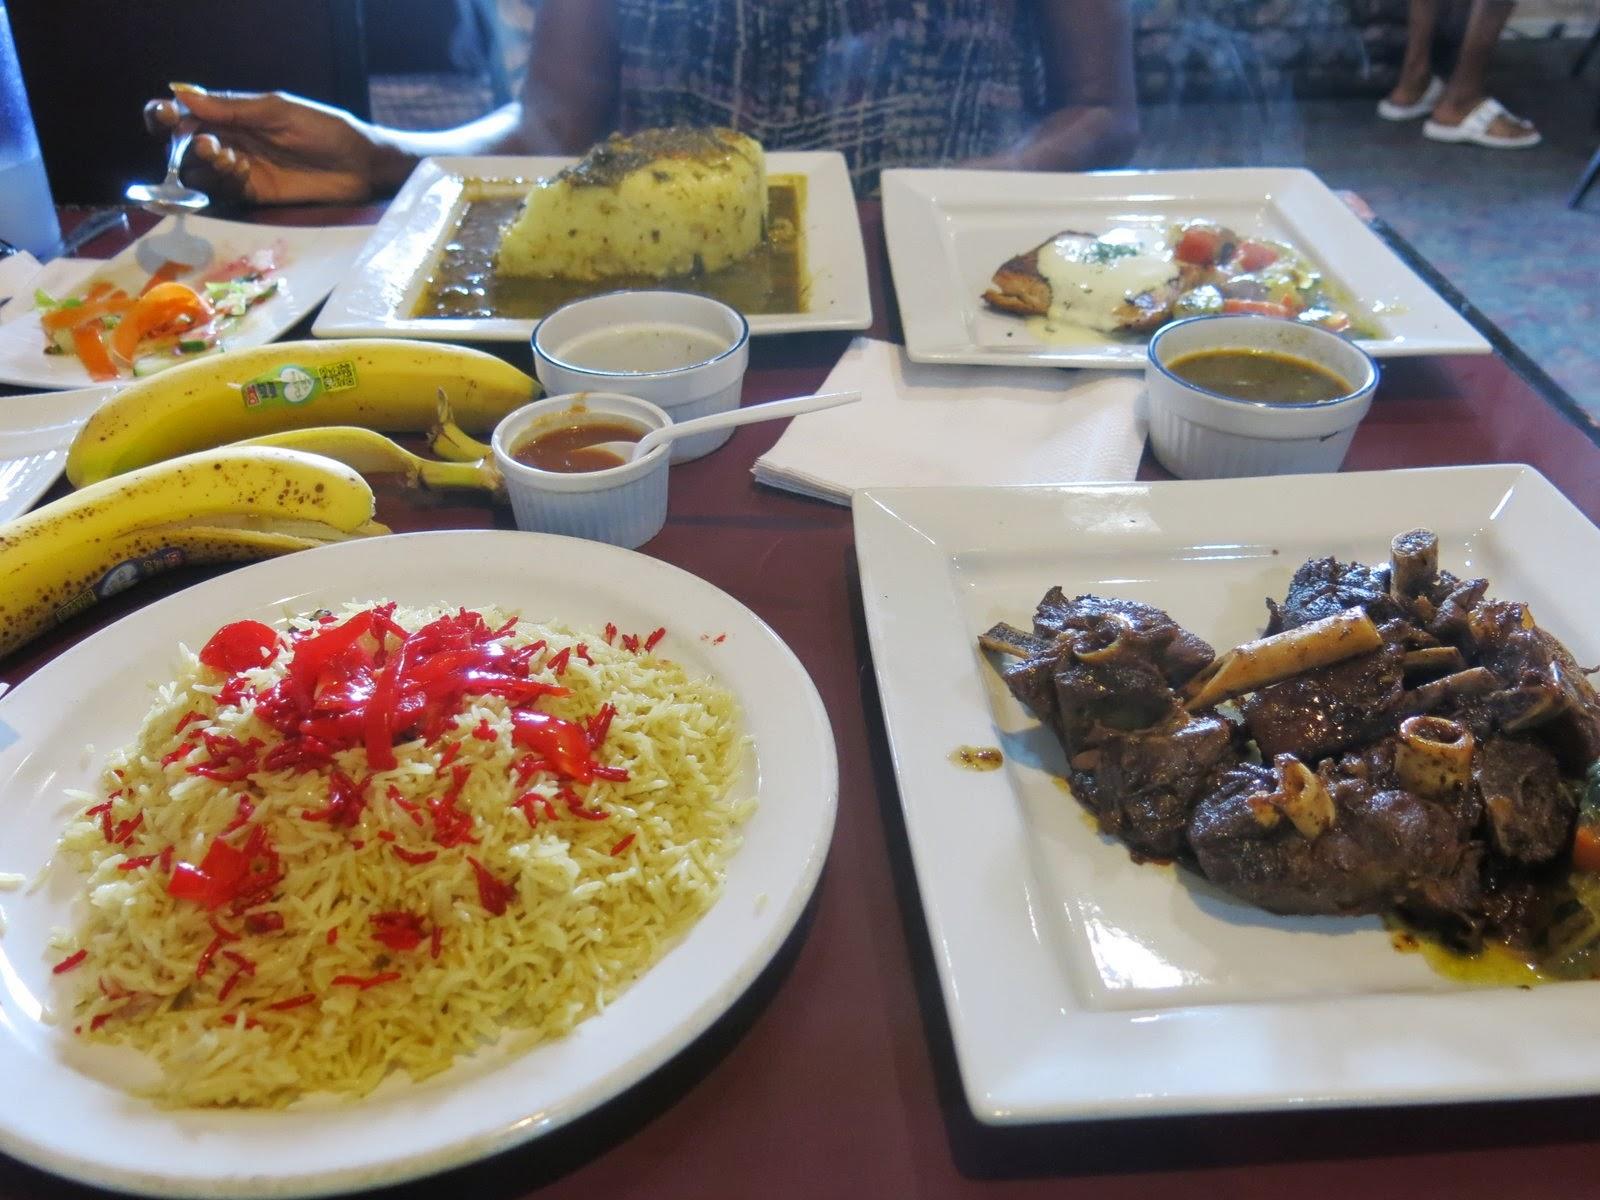 Sweets | The Somali Kitchen |Somali Wedding Food